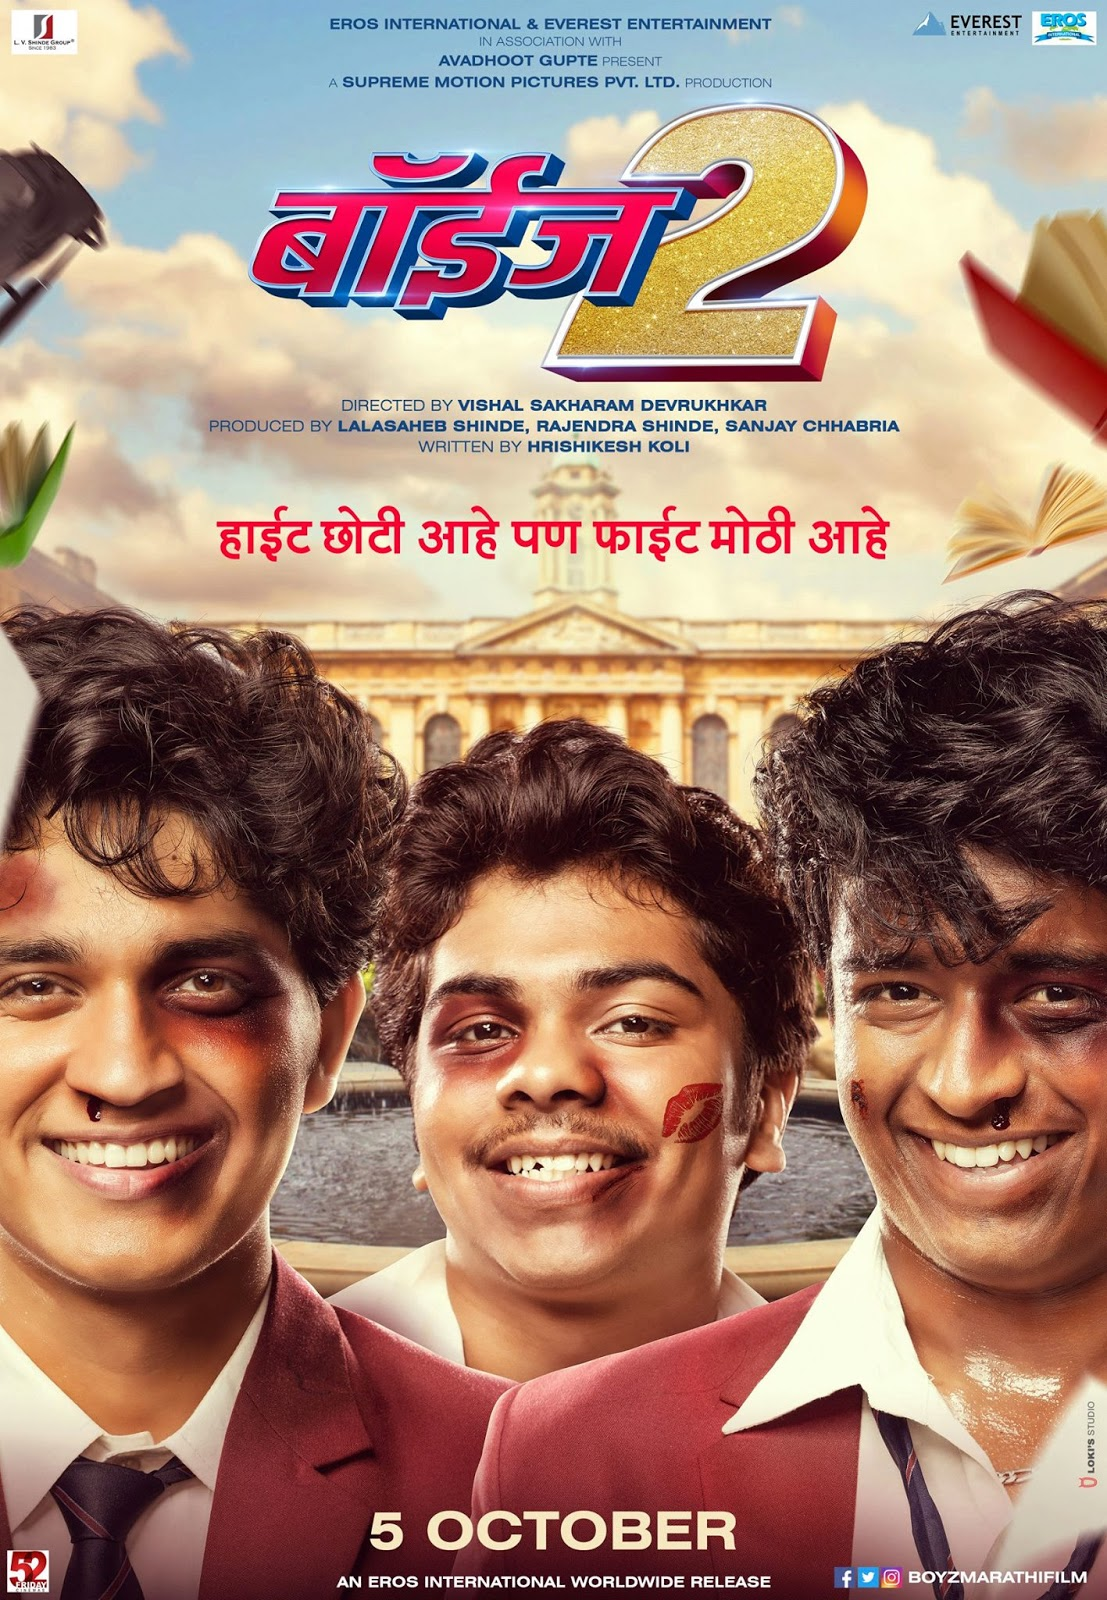 Marathi movie download sites